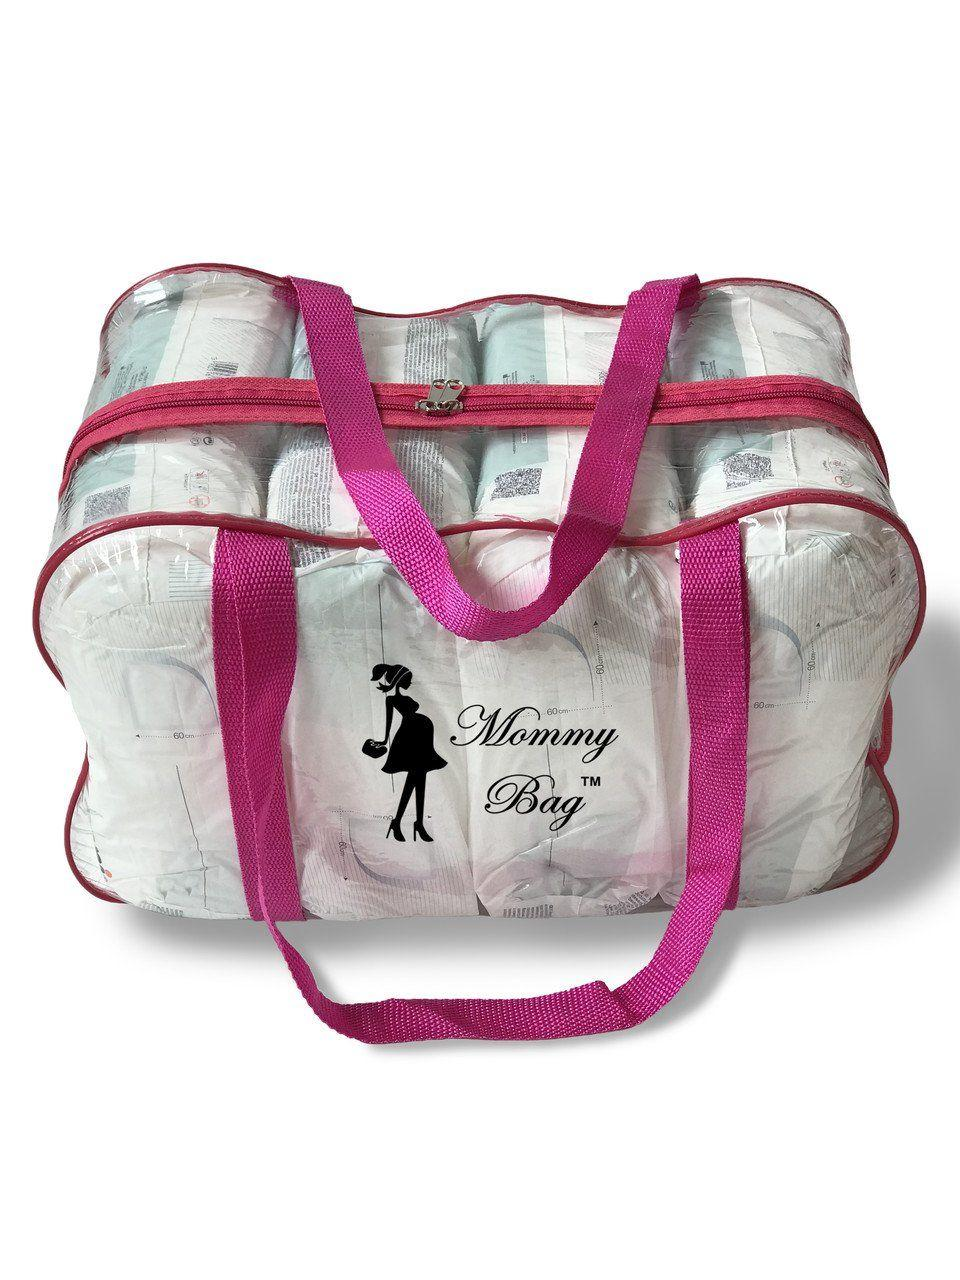 Сумка прозрачная в роддом Mommy Bag, размер - M, цвет - Розовый